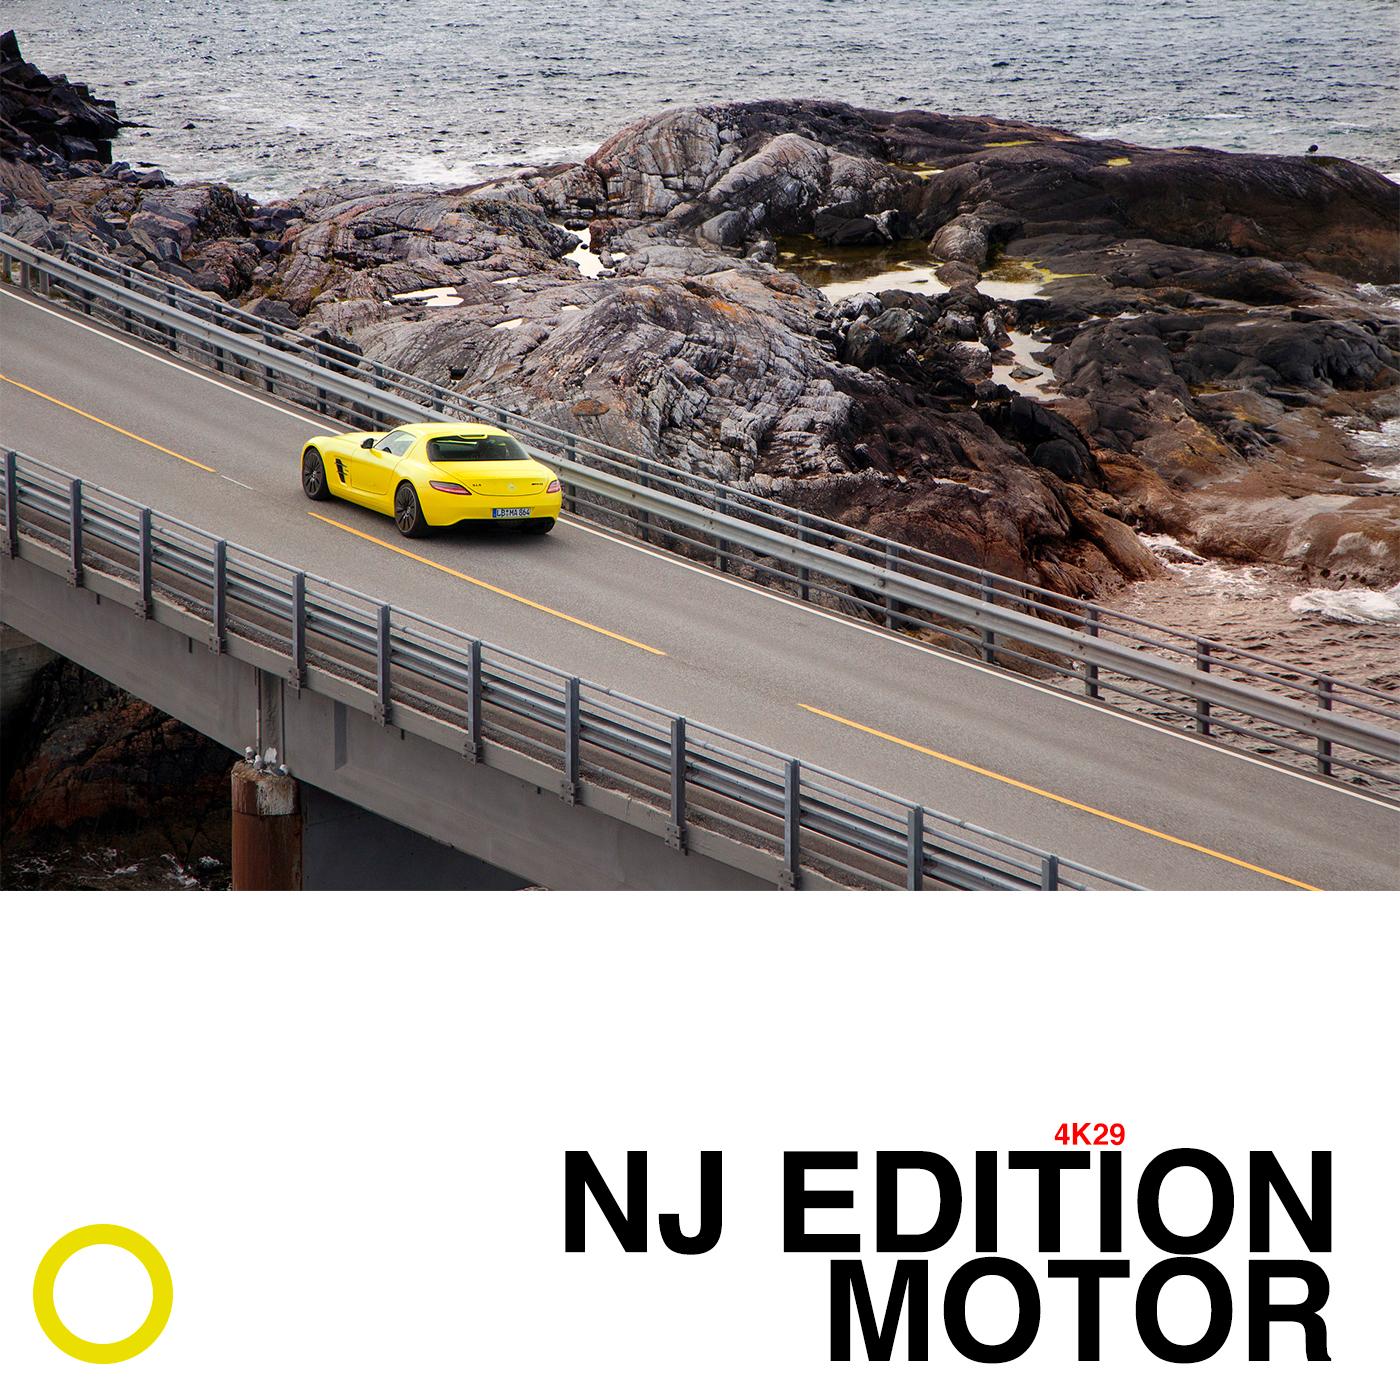 NJ EDITION MOTOR 4K29